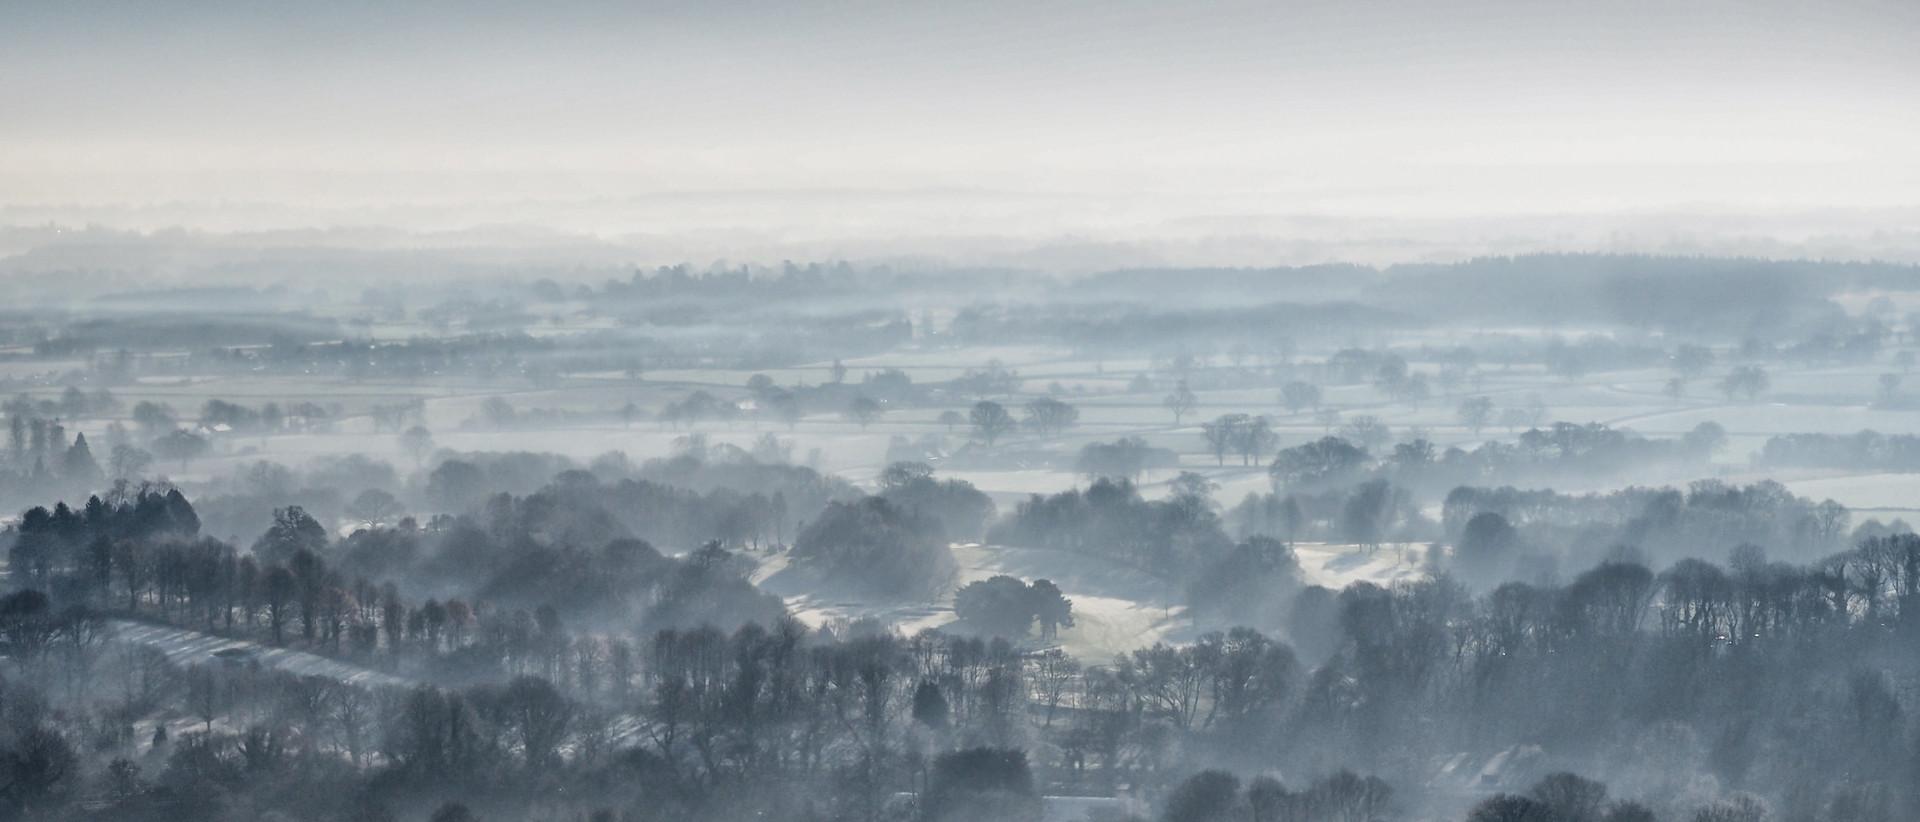 Mist at Box Hill (copyright: Philip J. Richter)